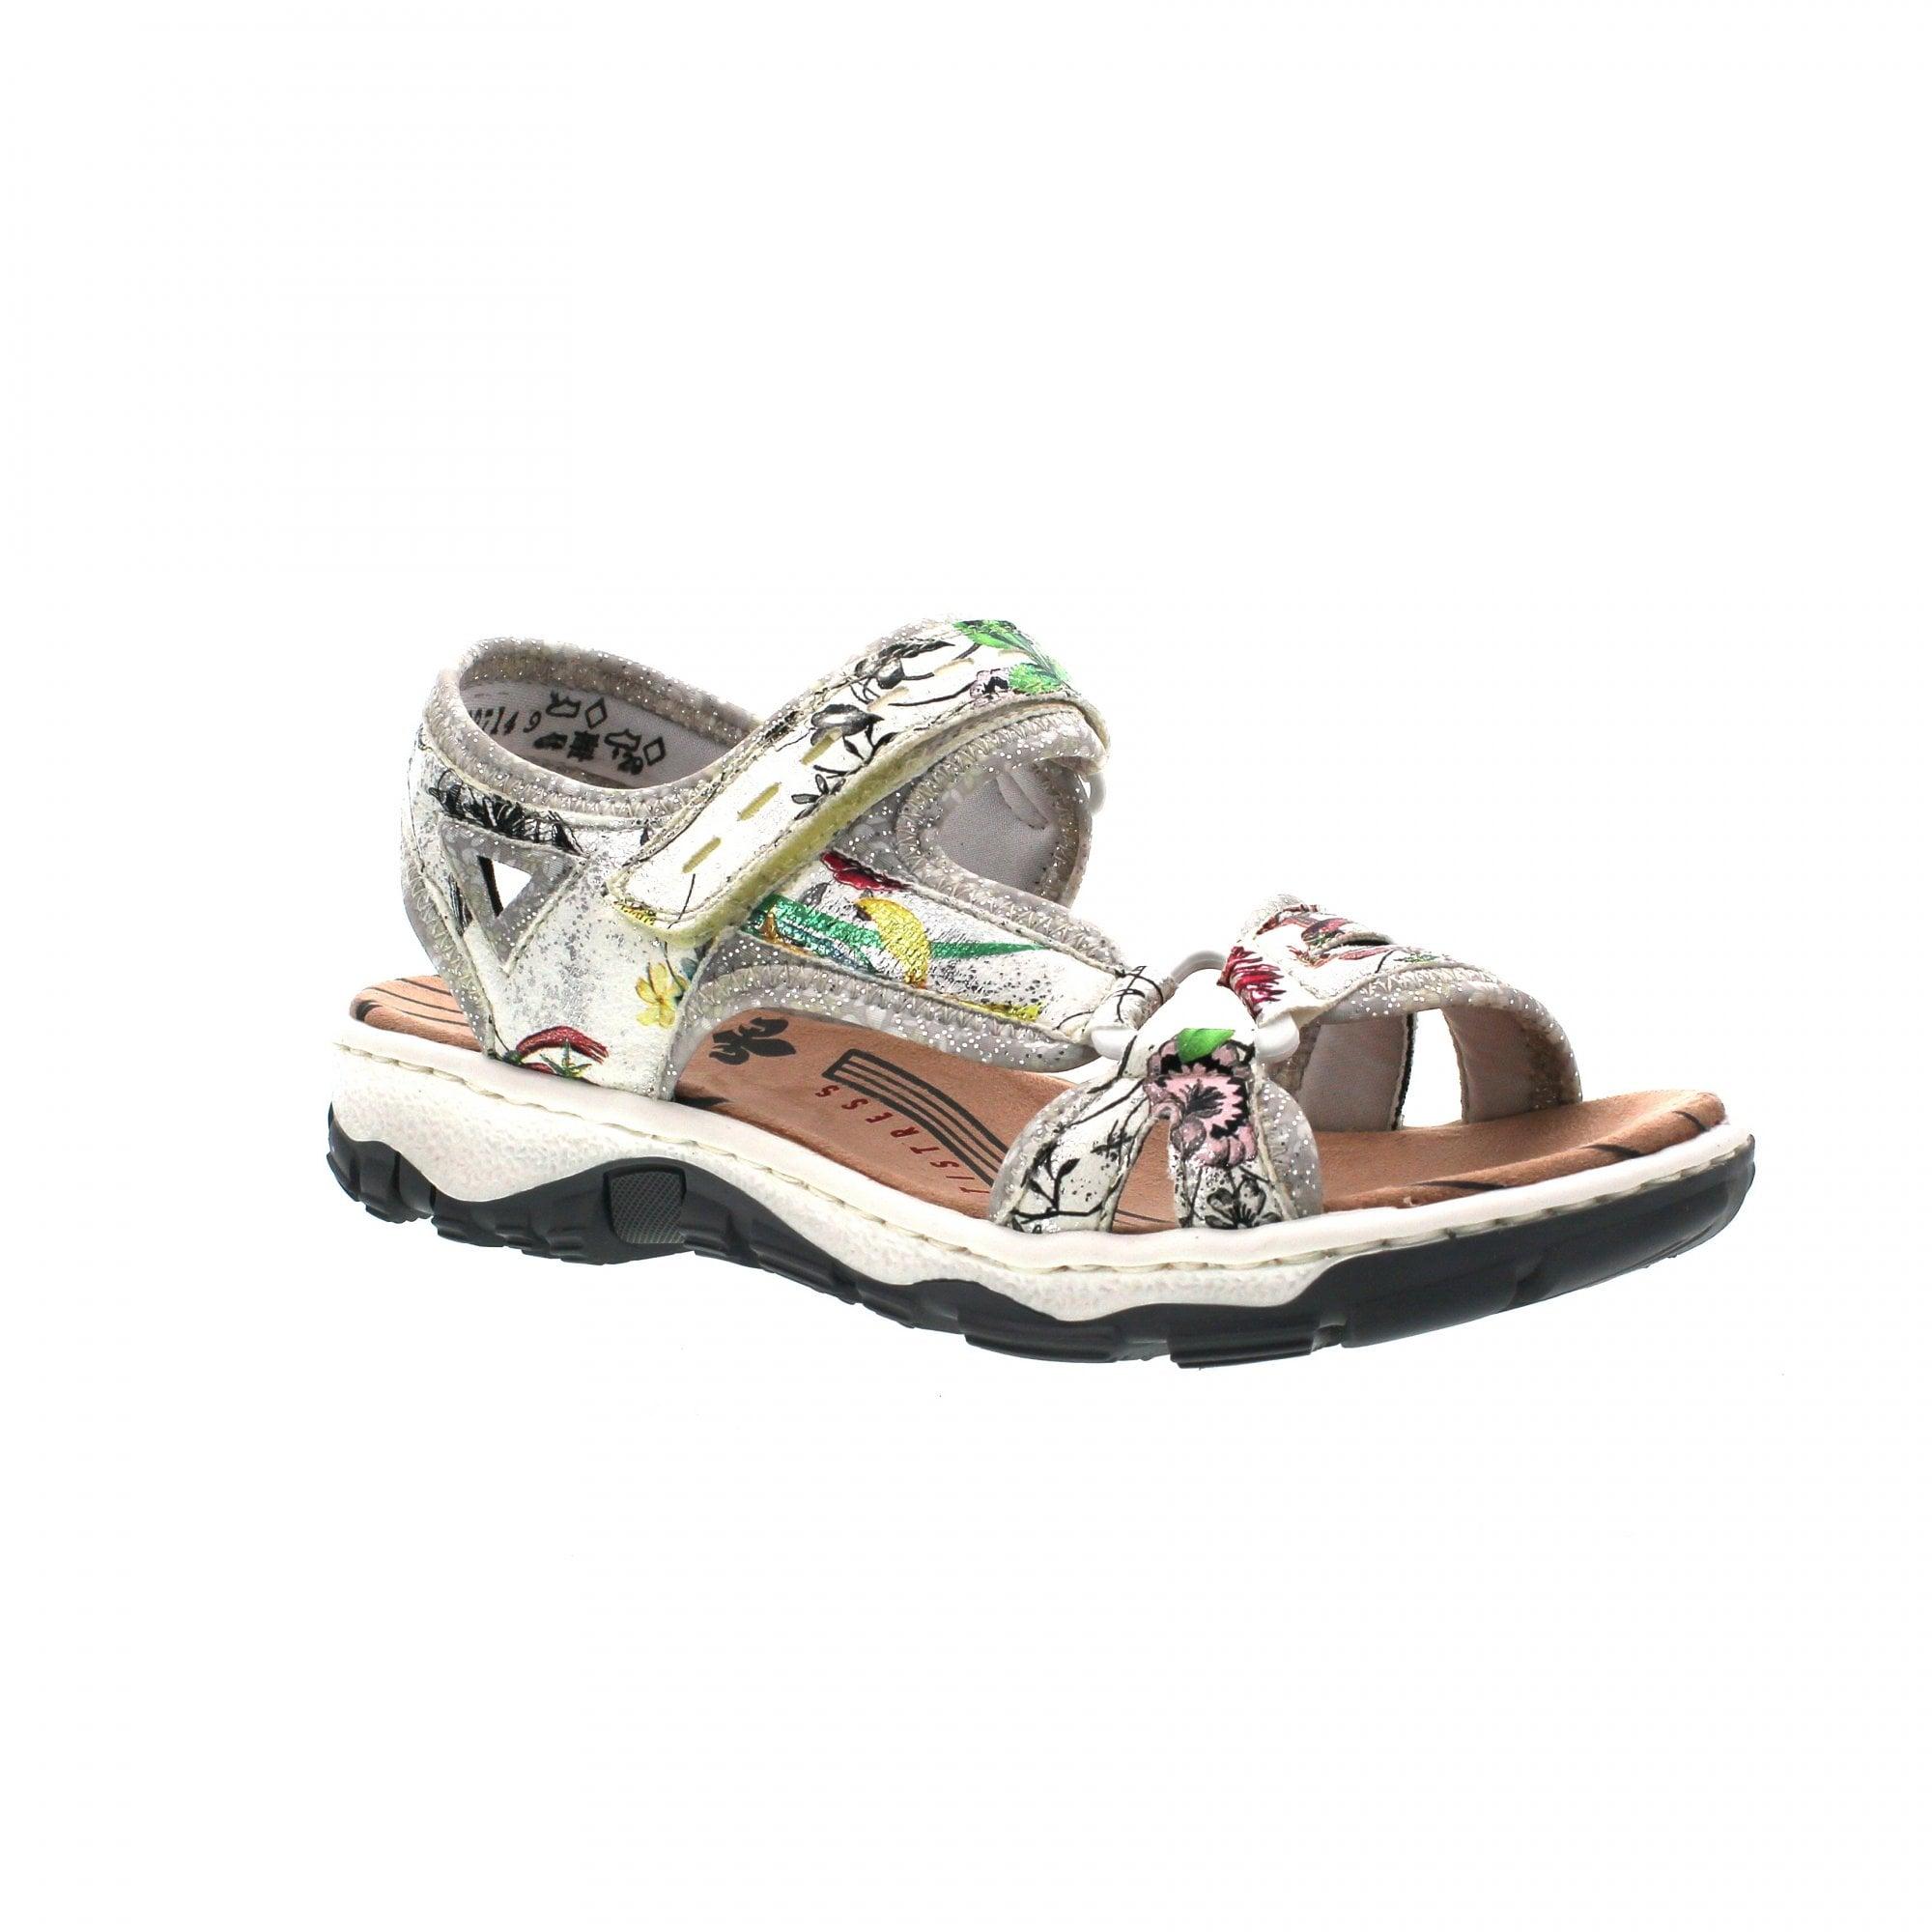 Rieker 68879-90 Womens Walking Sandals